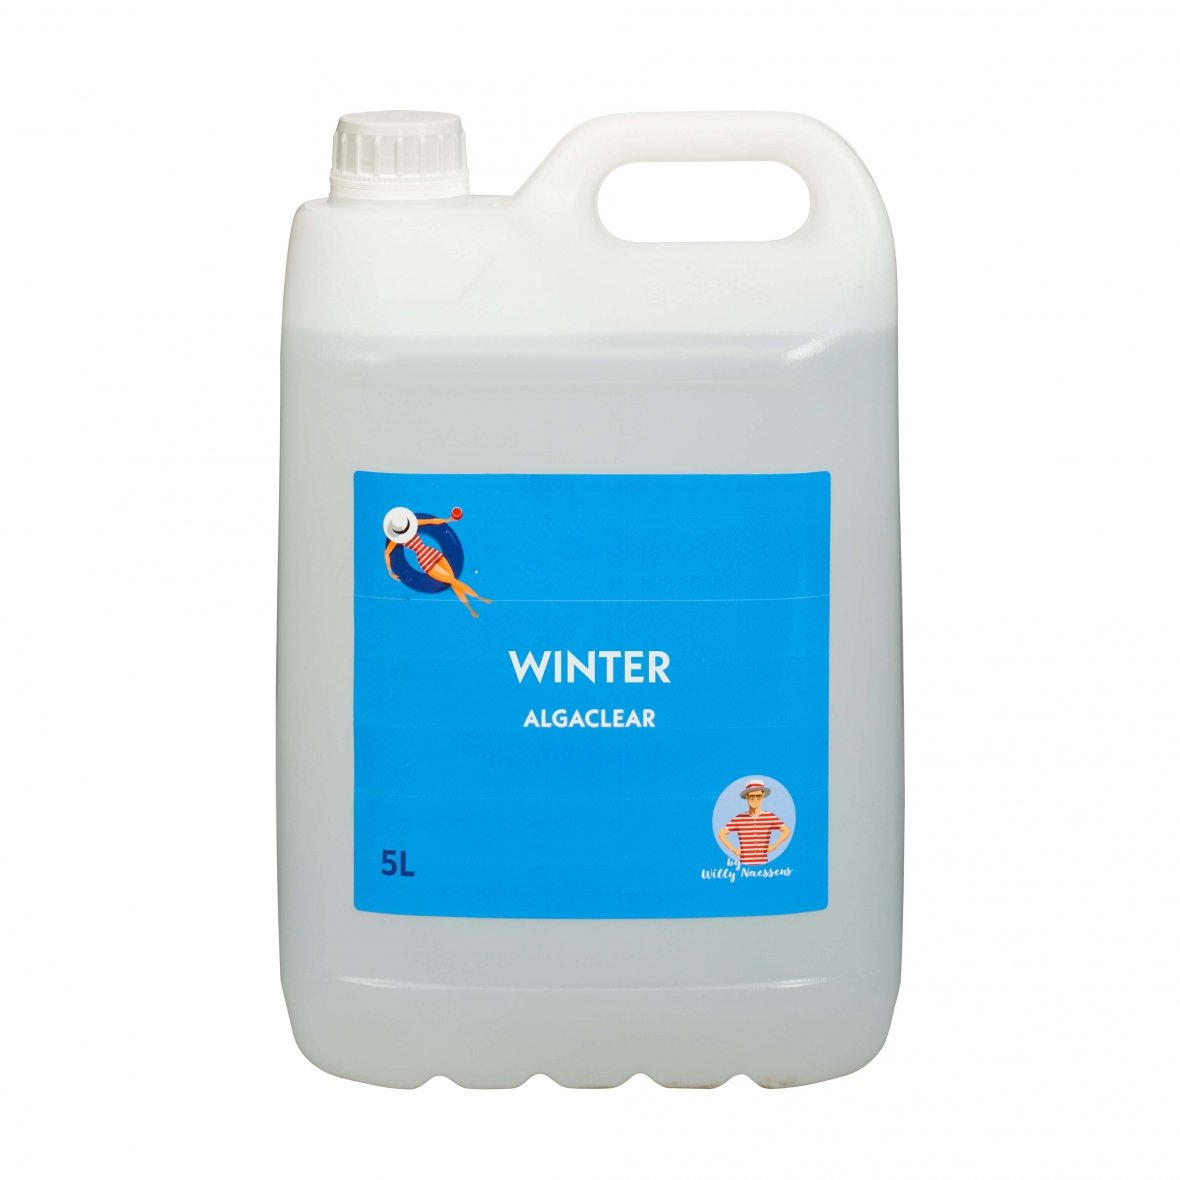 Winterproduct  5 l